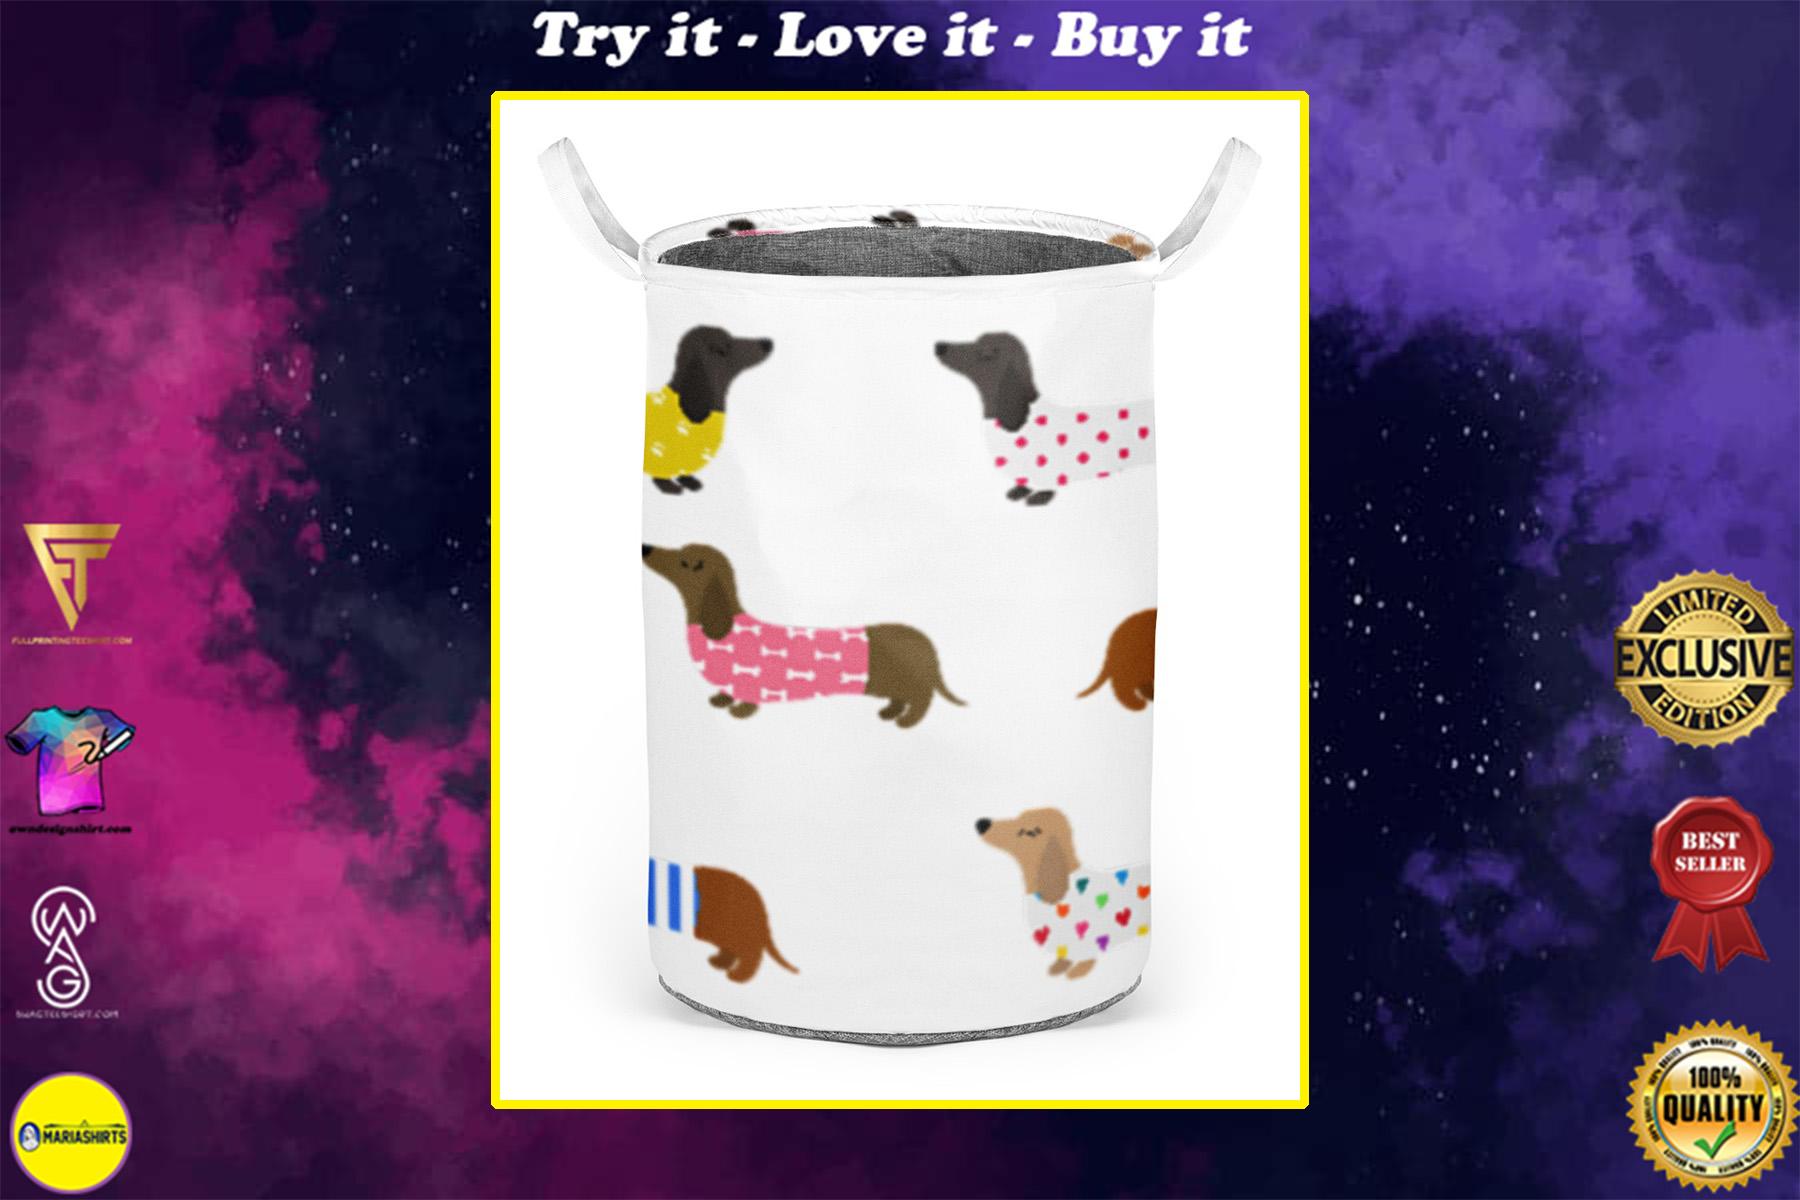 dachshund dog all over printed laundry basket